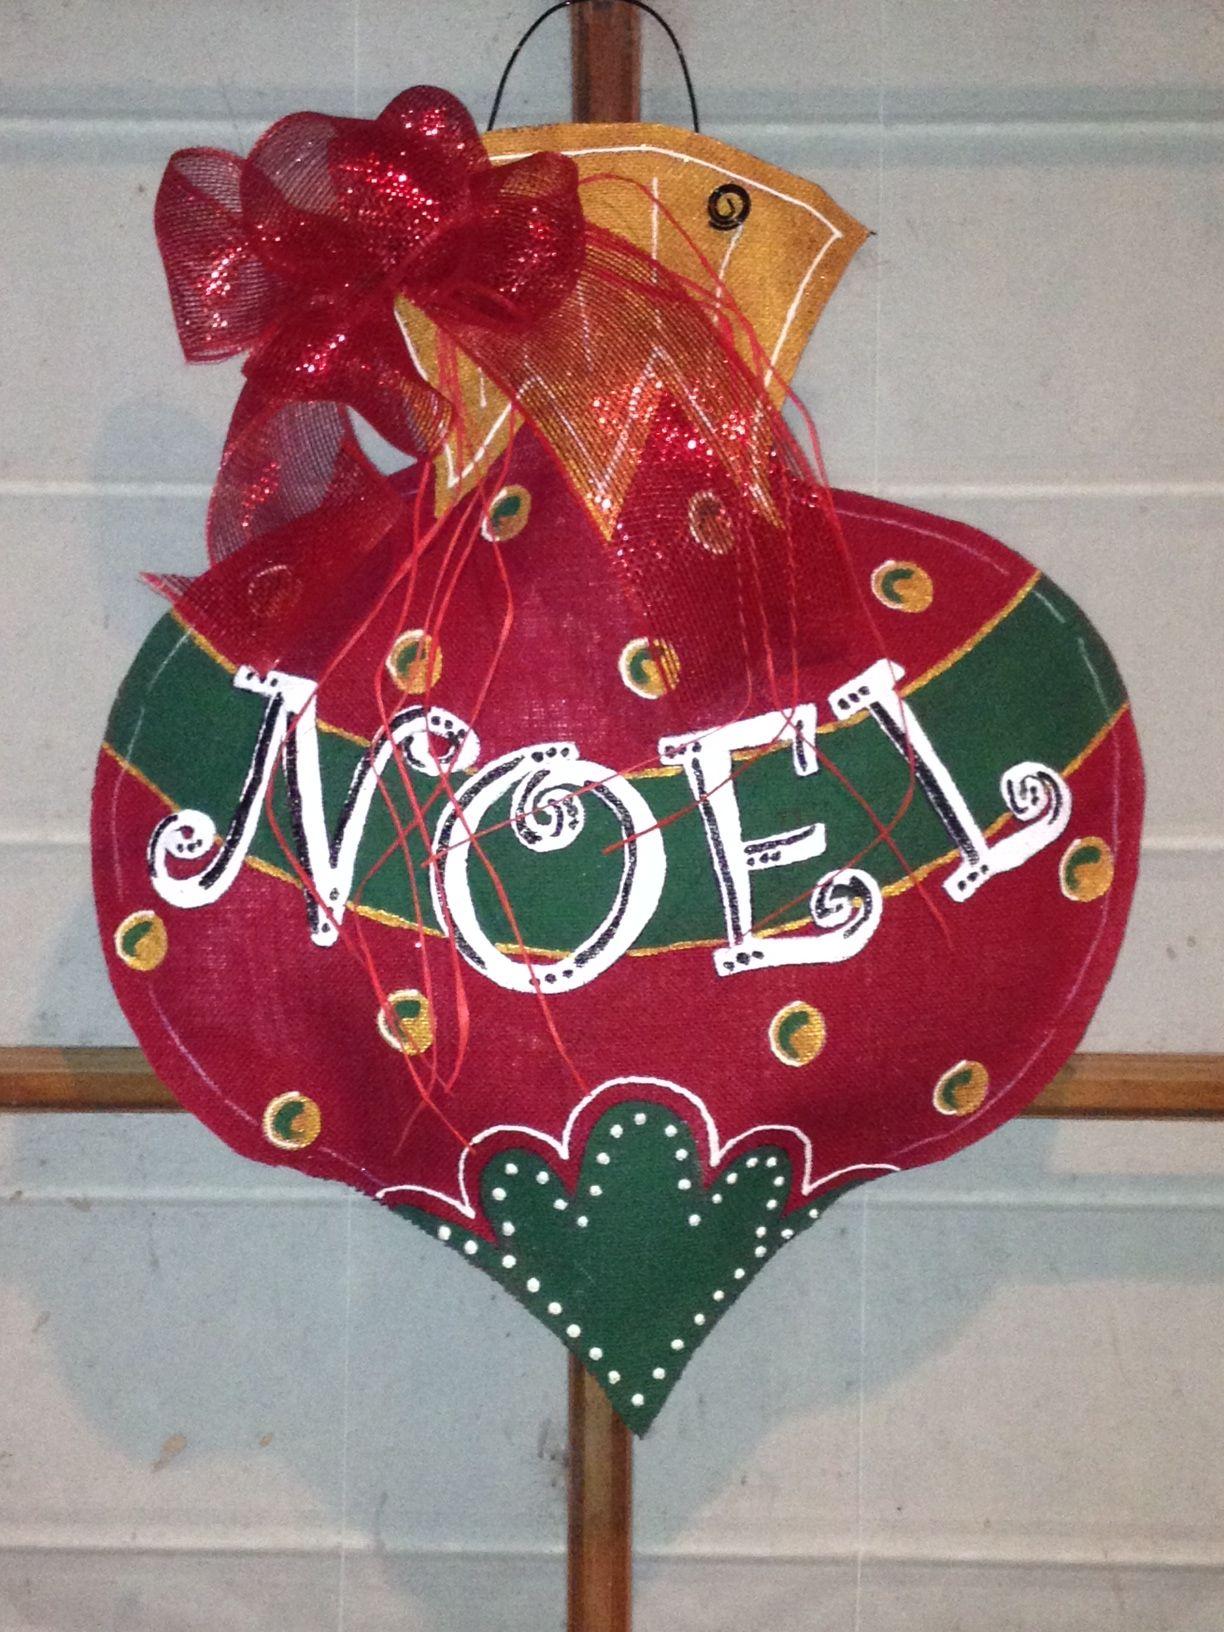 Burlap Christmas Ornament Door Hanger Signs And Sayings